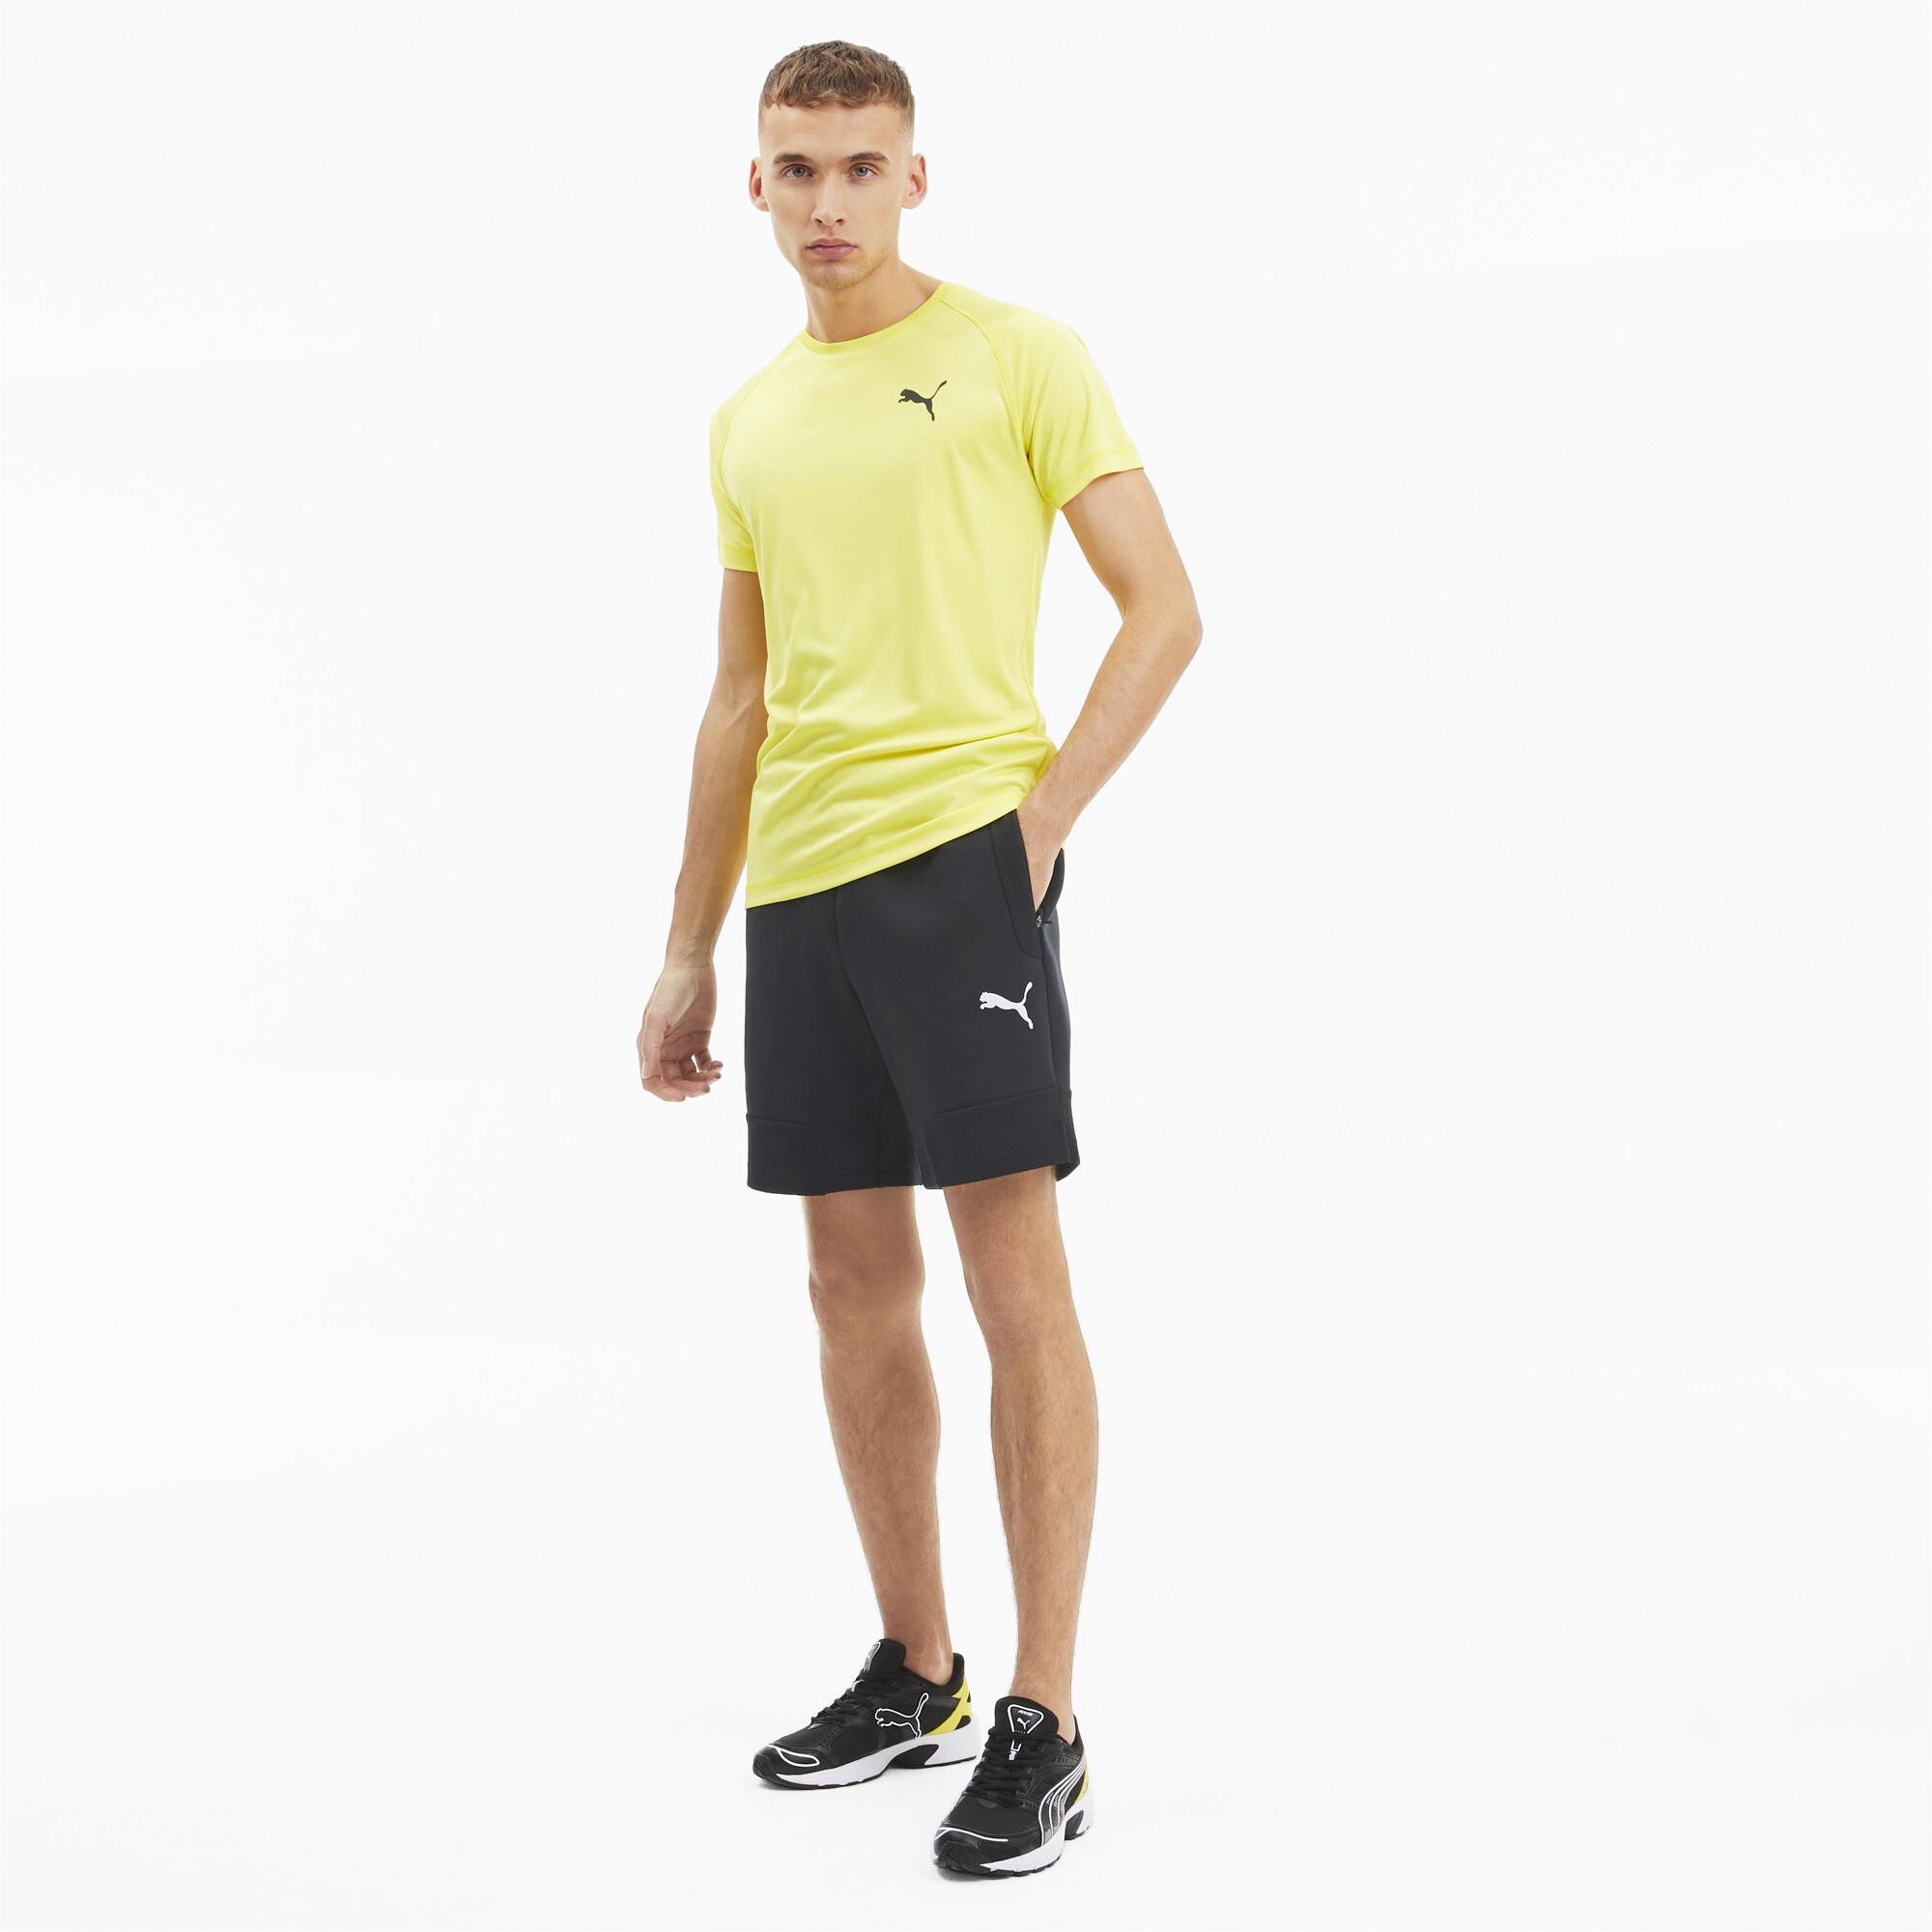 PUMA-Evostripe-Men-039-s-Shorts-Men-Knitted-Shorts-Basics thumbnail 6